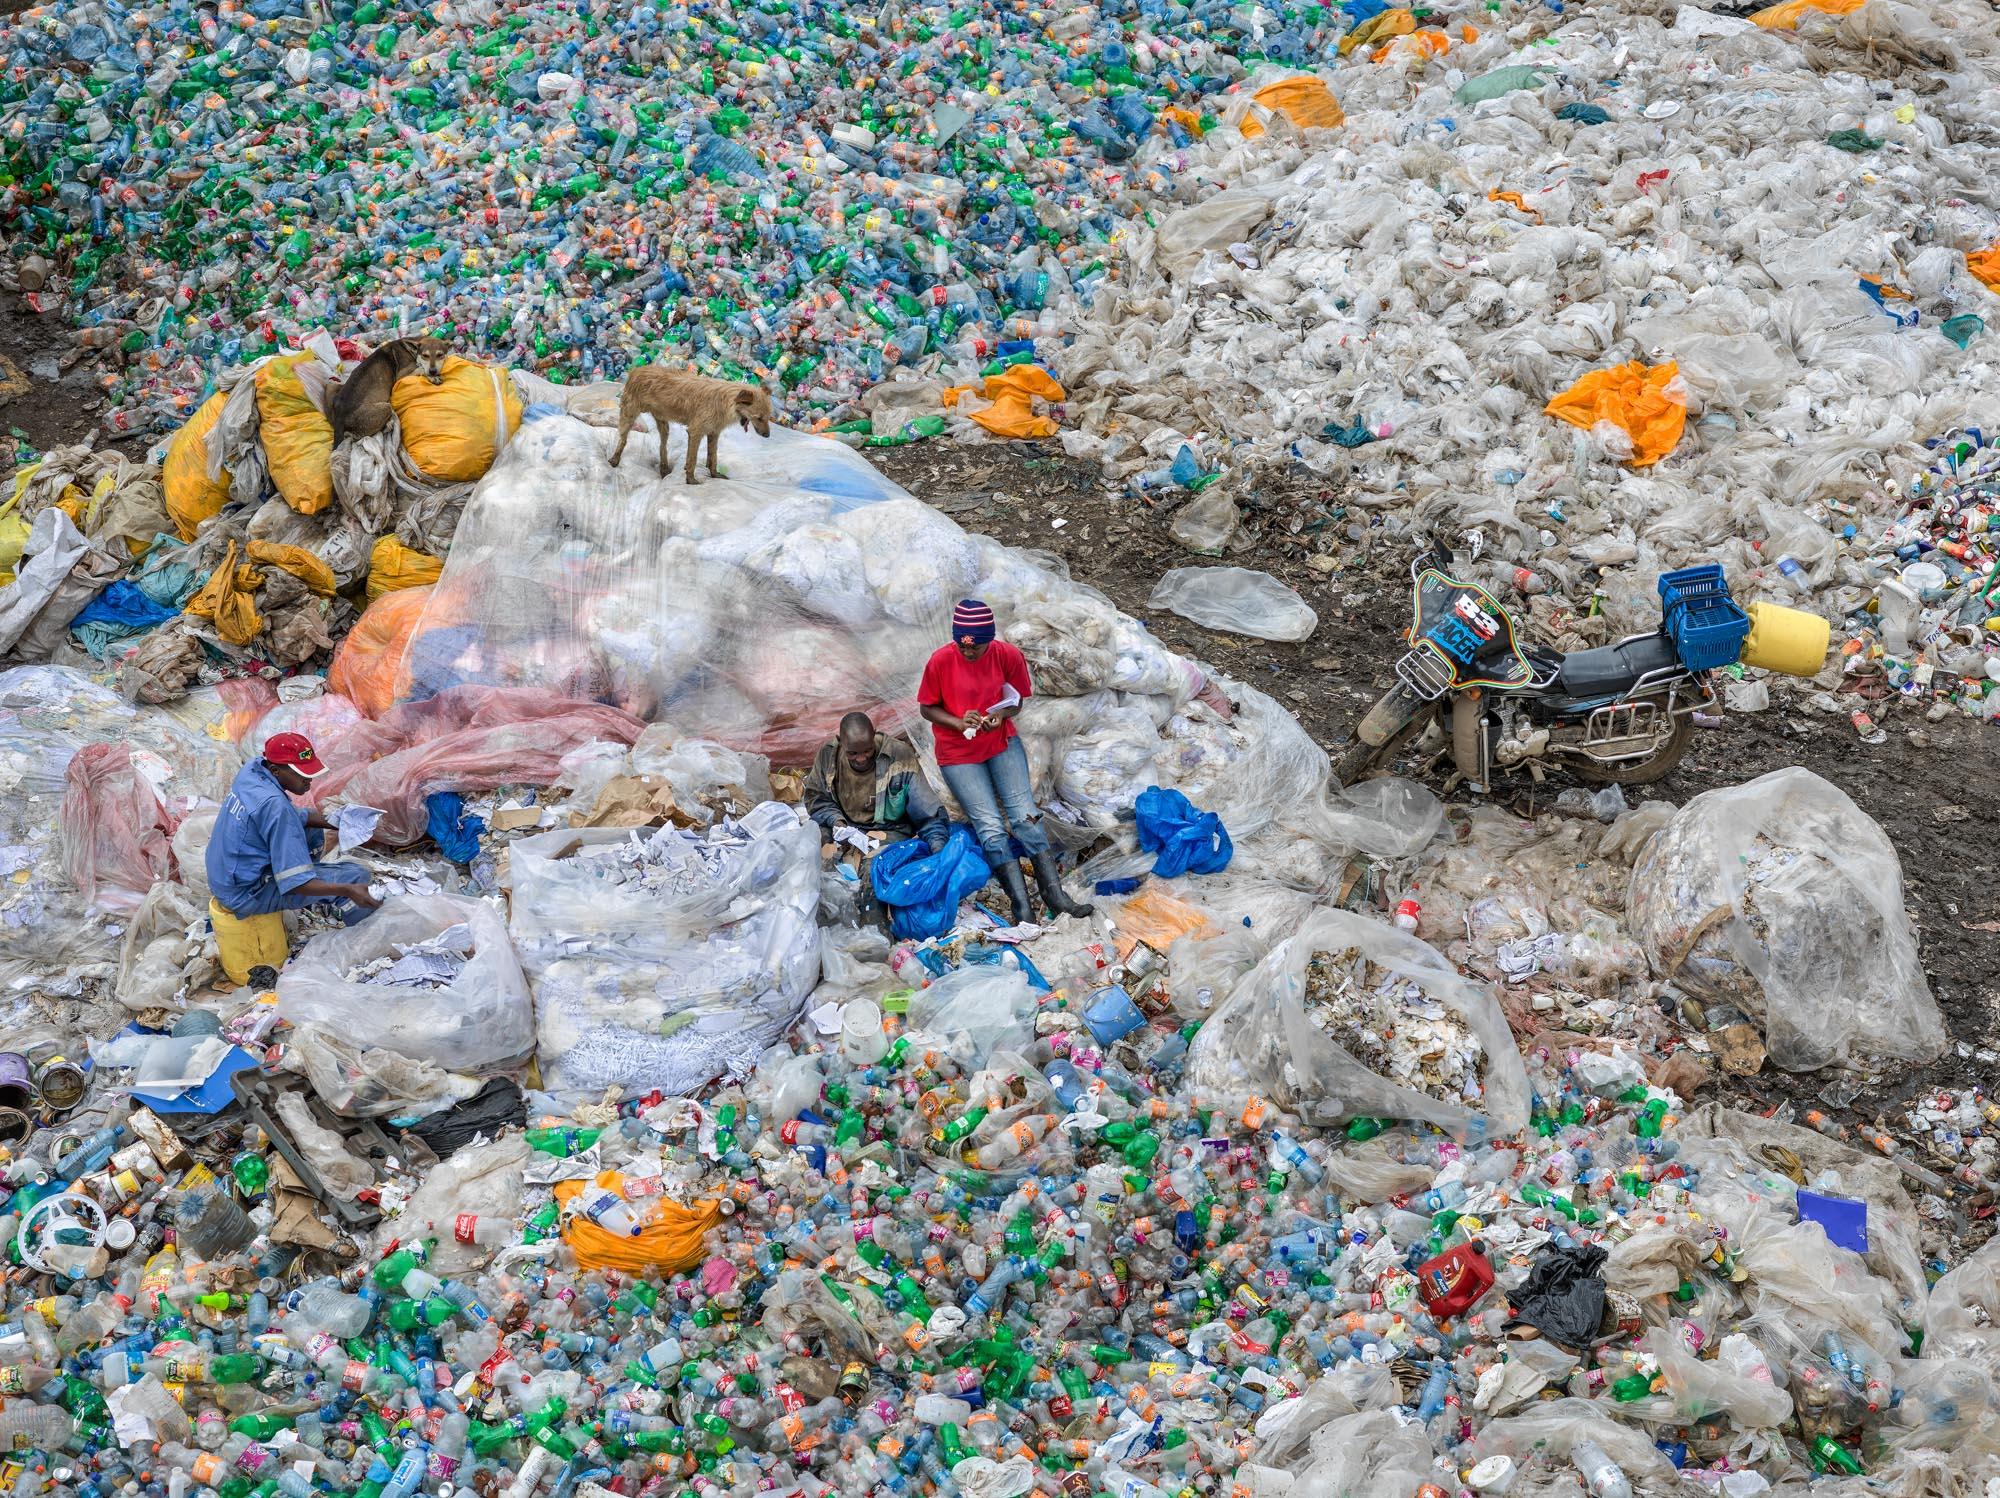 Dandora Landfill #3, Plastics Recycling, Nairobi, Kenya, 2016. Click on the audio player below to listen to the audio description.